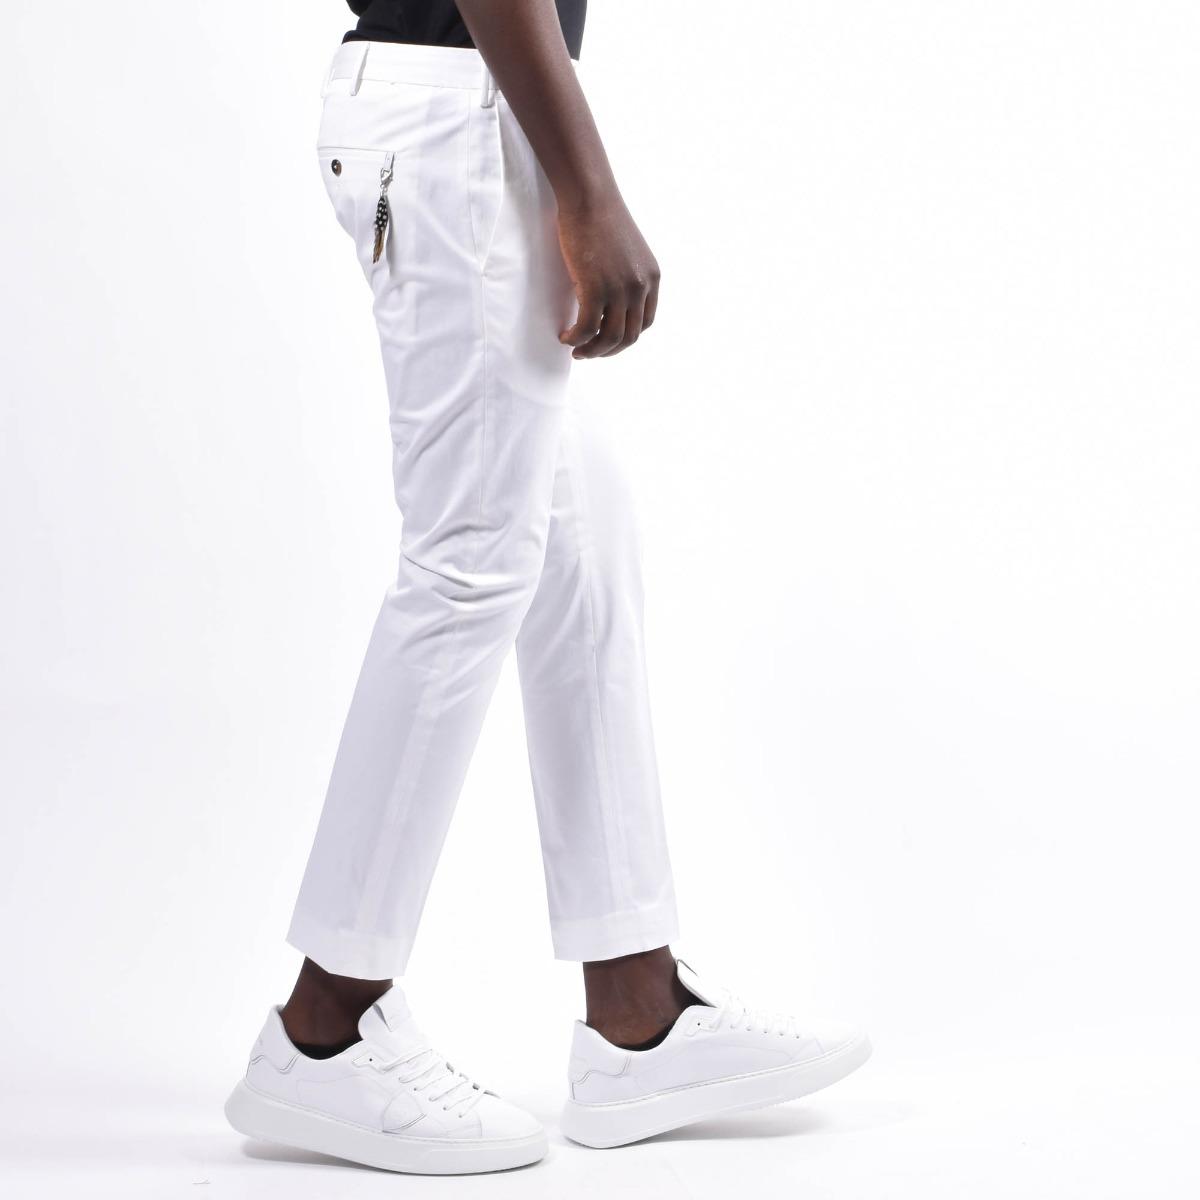 Pantalone pendente piuma - Bianco